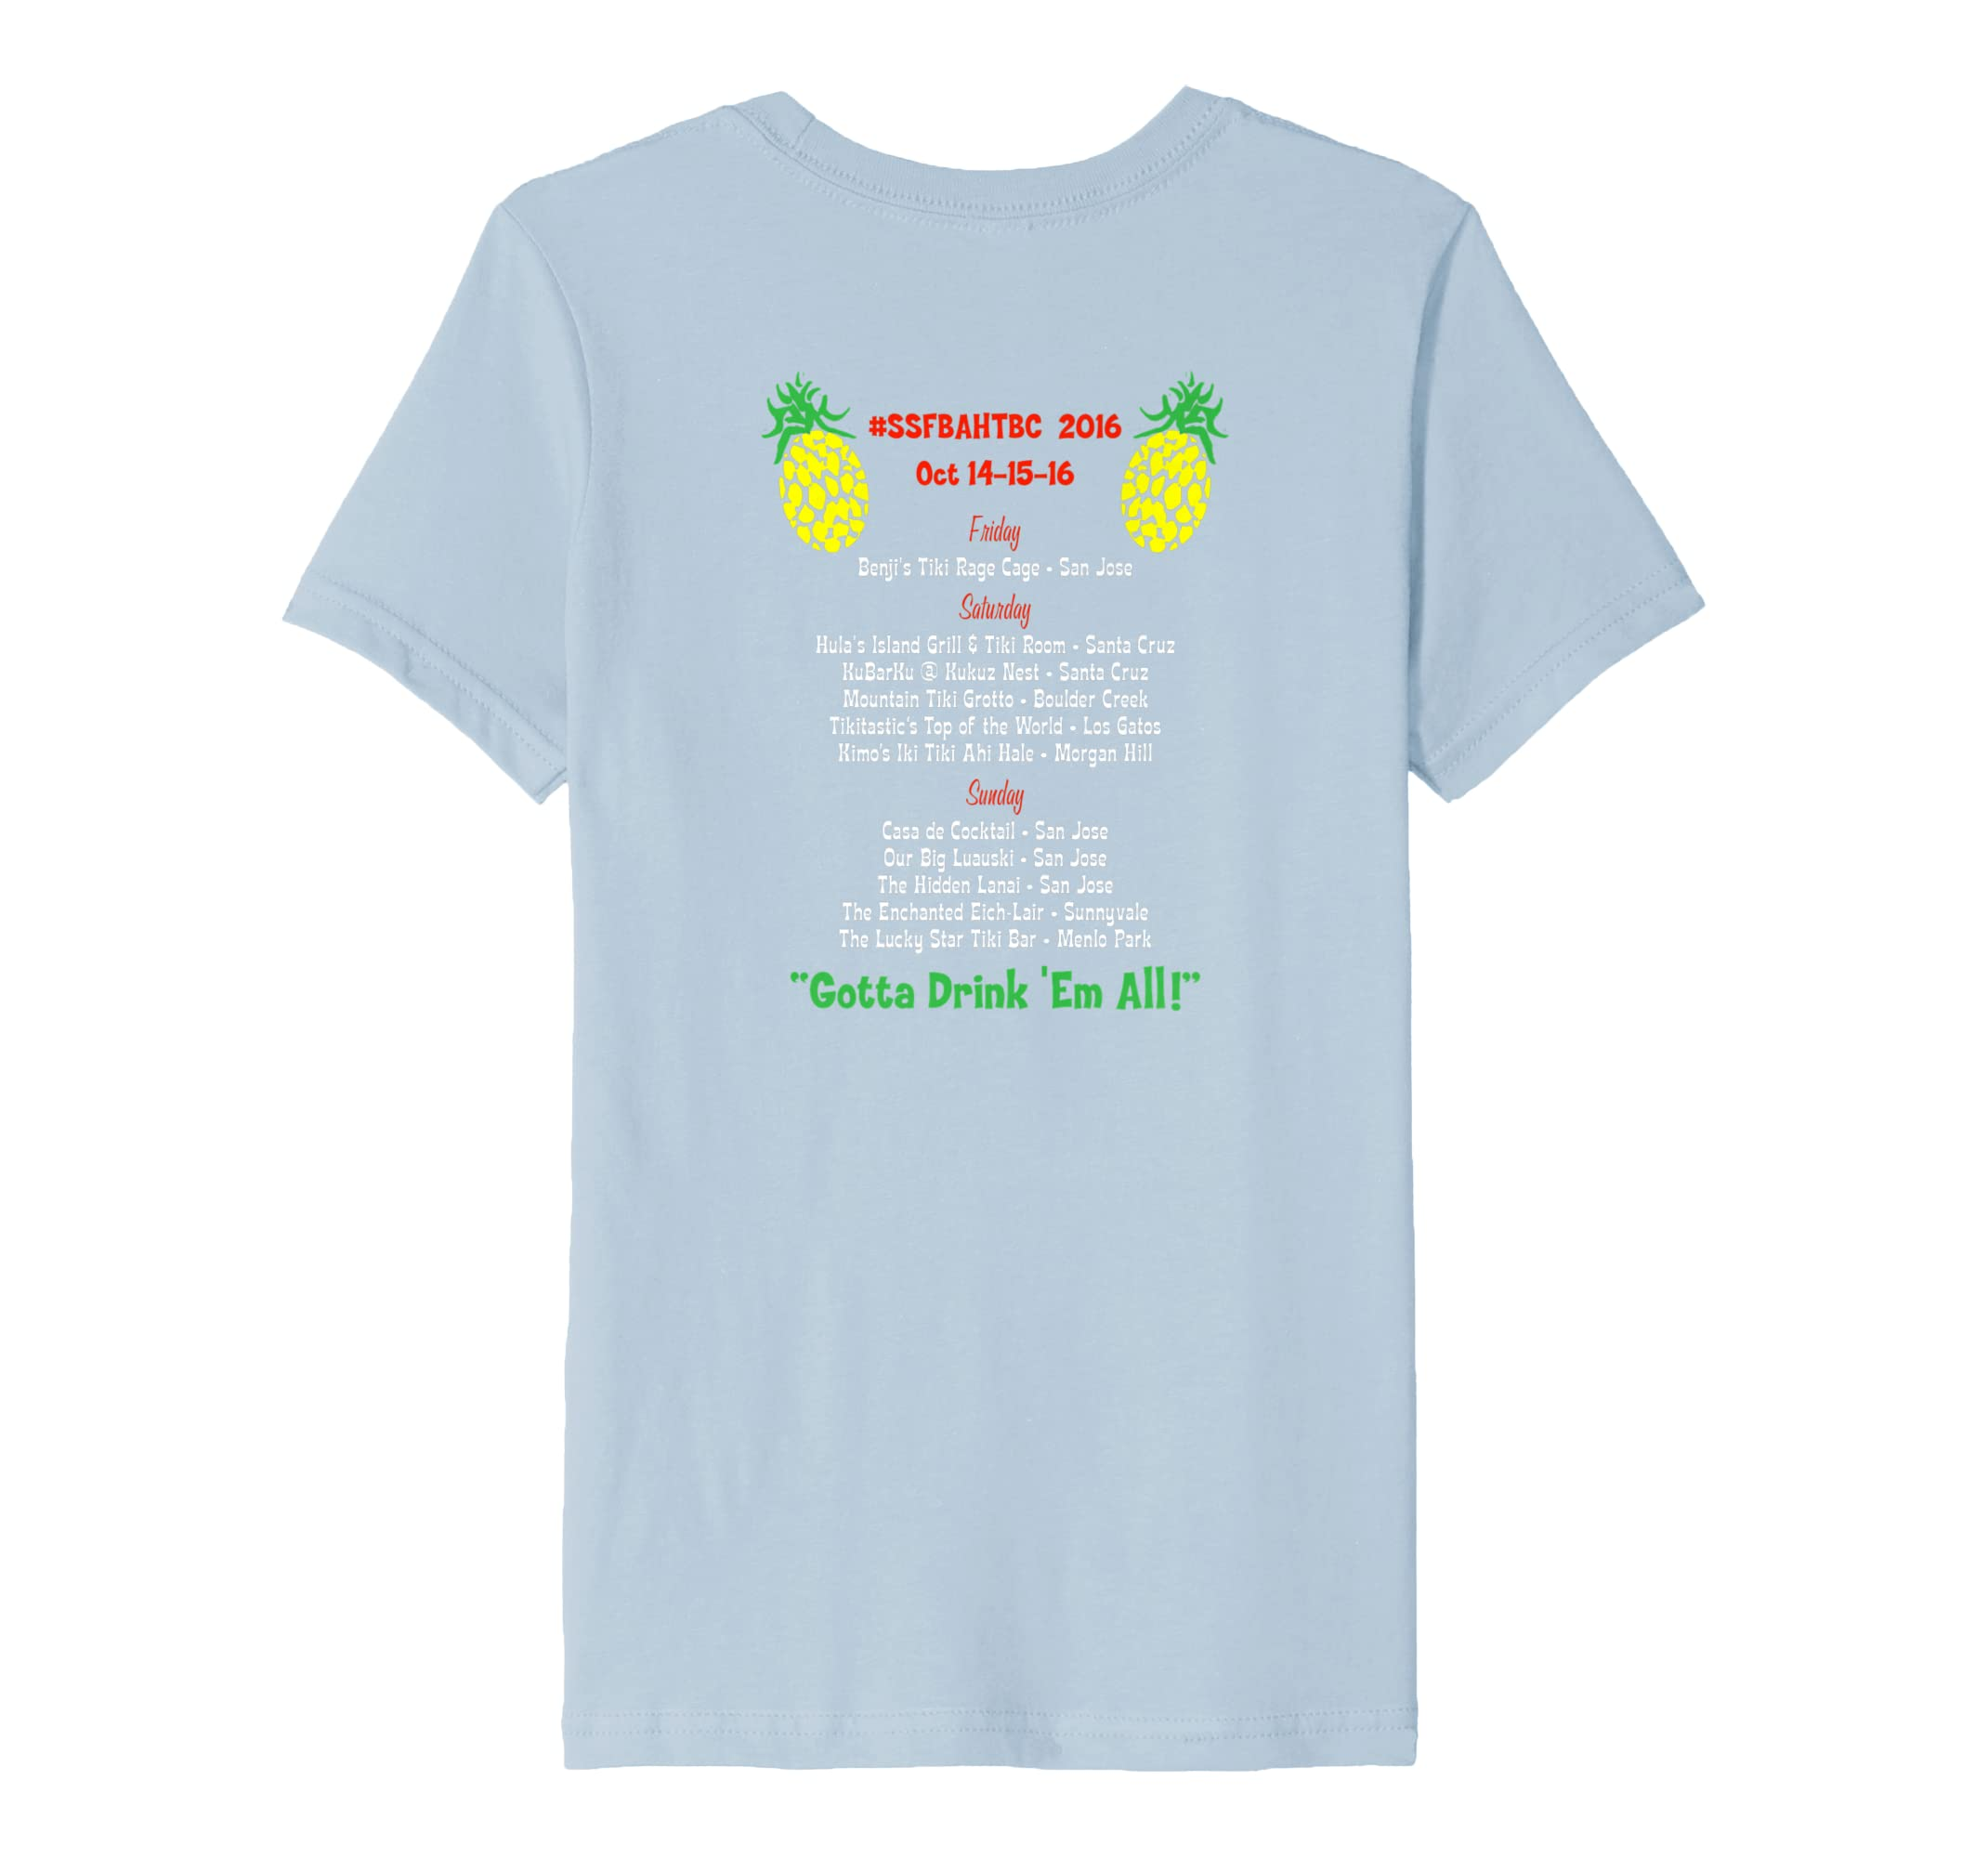 Amazon.com: 2016 South SF Bay Area Home Tiki Bar Crawl Official T-Shirt: Clothing